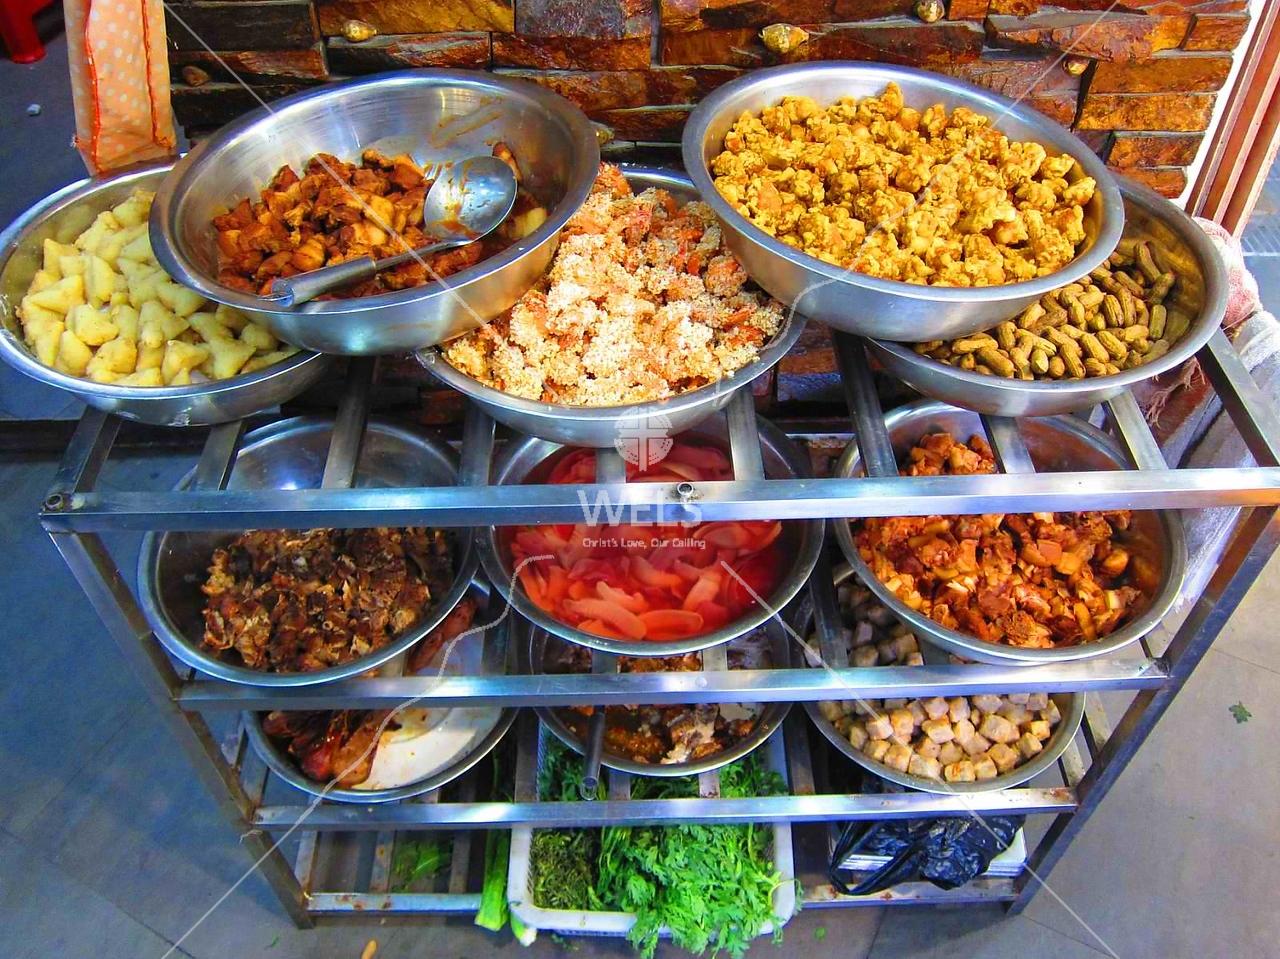 Restaurant kitchen, needed cooking items,  SE coastal village China by kstellick